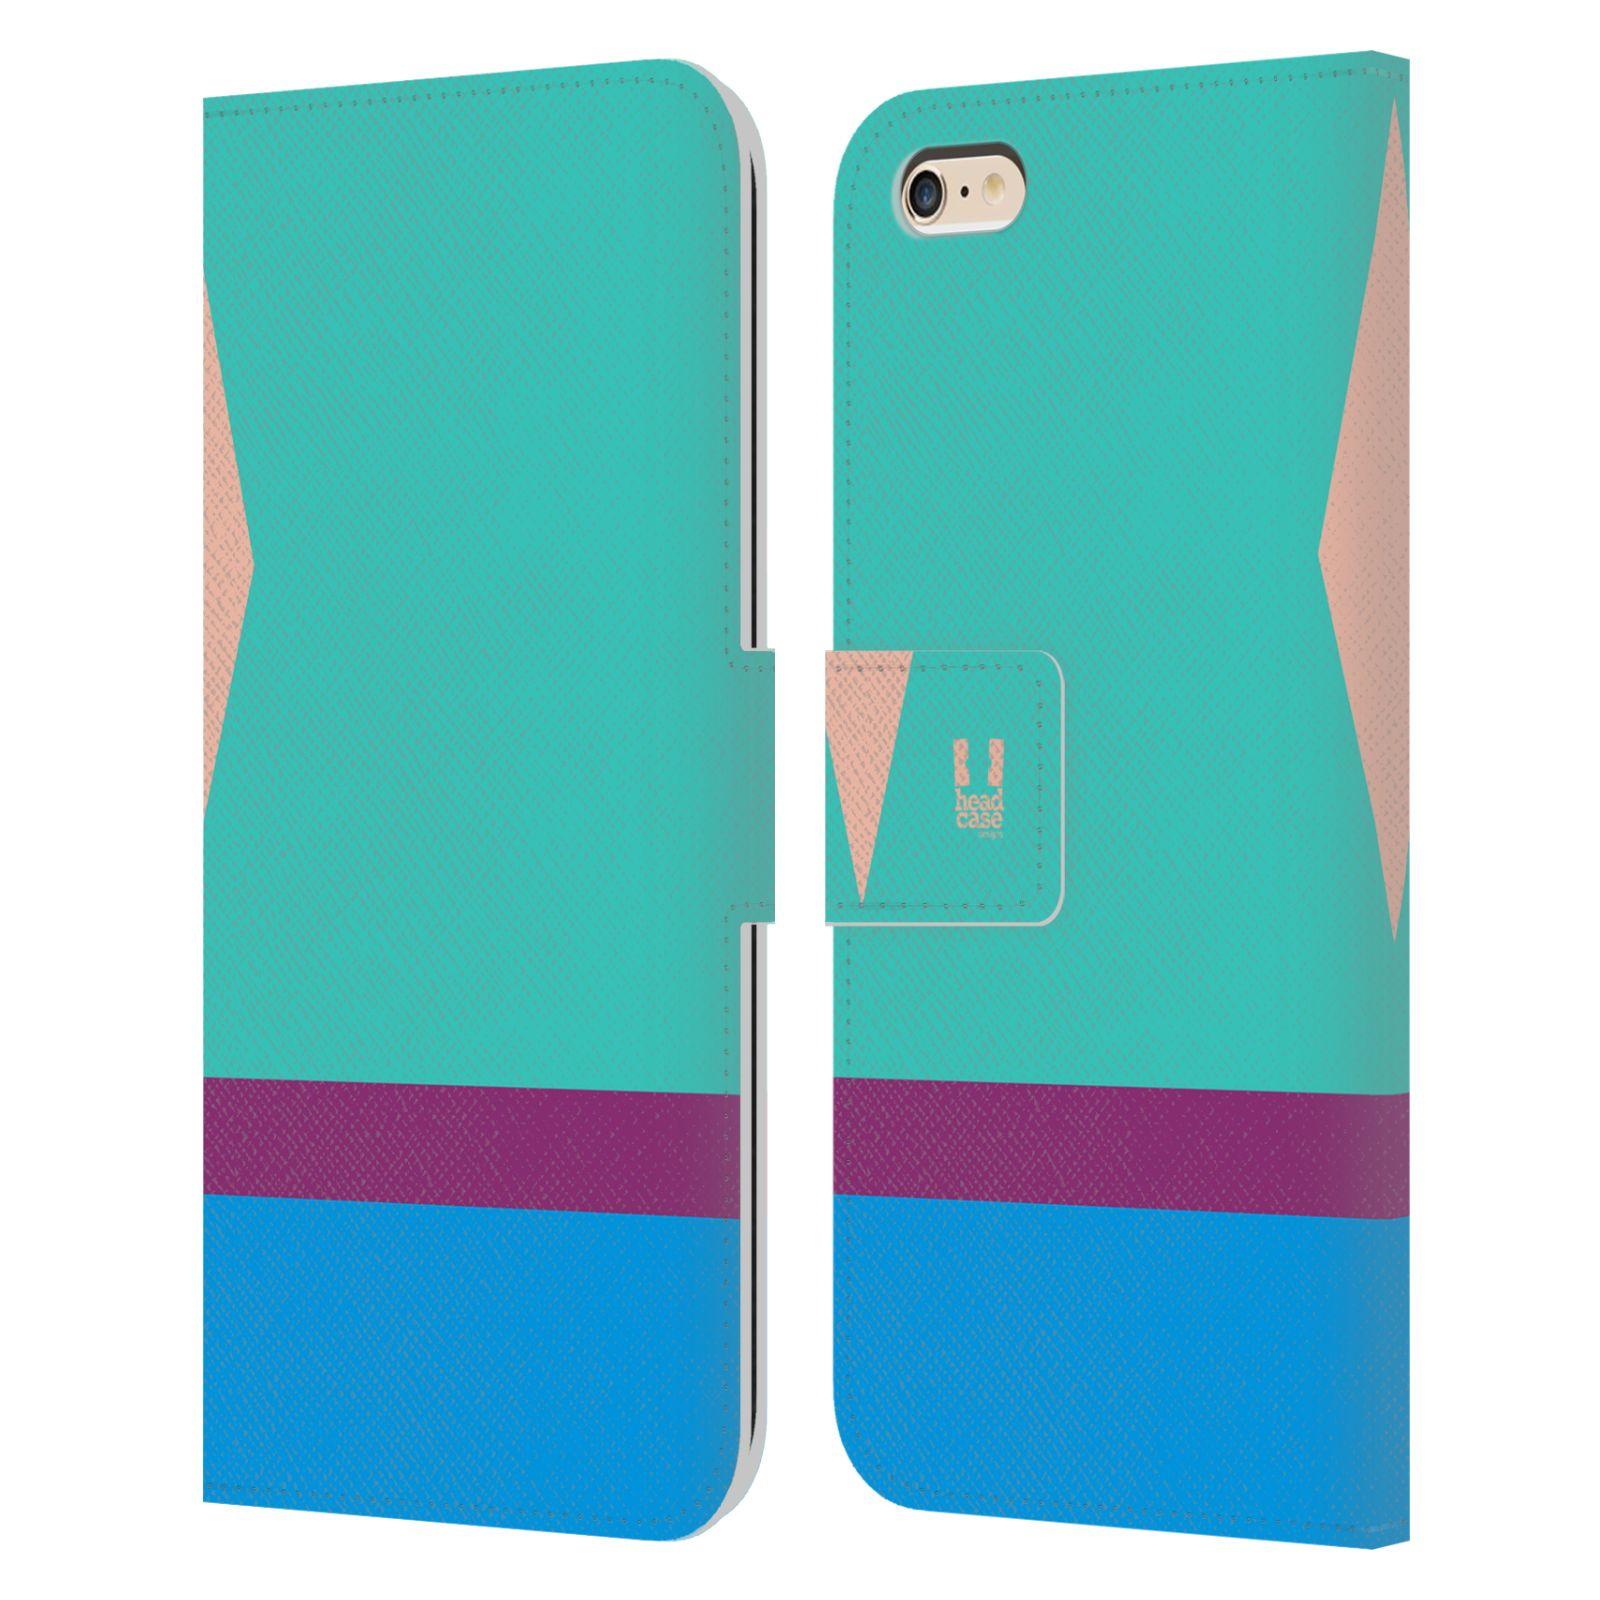 HEAD CASE Flipové pouzdro pro mobil Apple Iphone 6 PLUS/6S PLUS barevné tvary modrá a fialový pruh